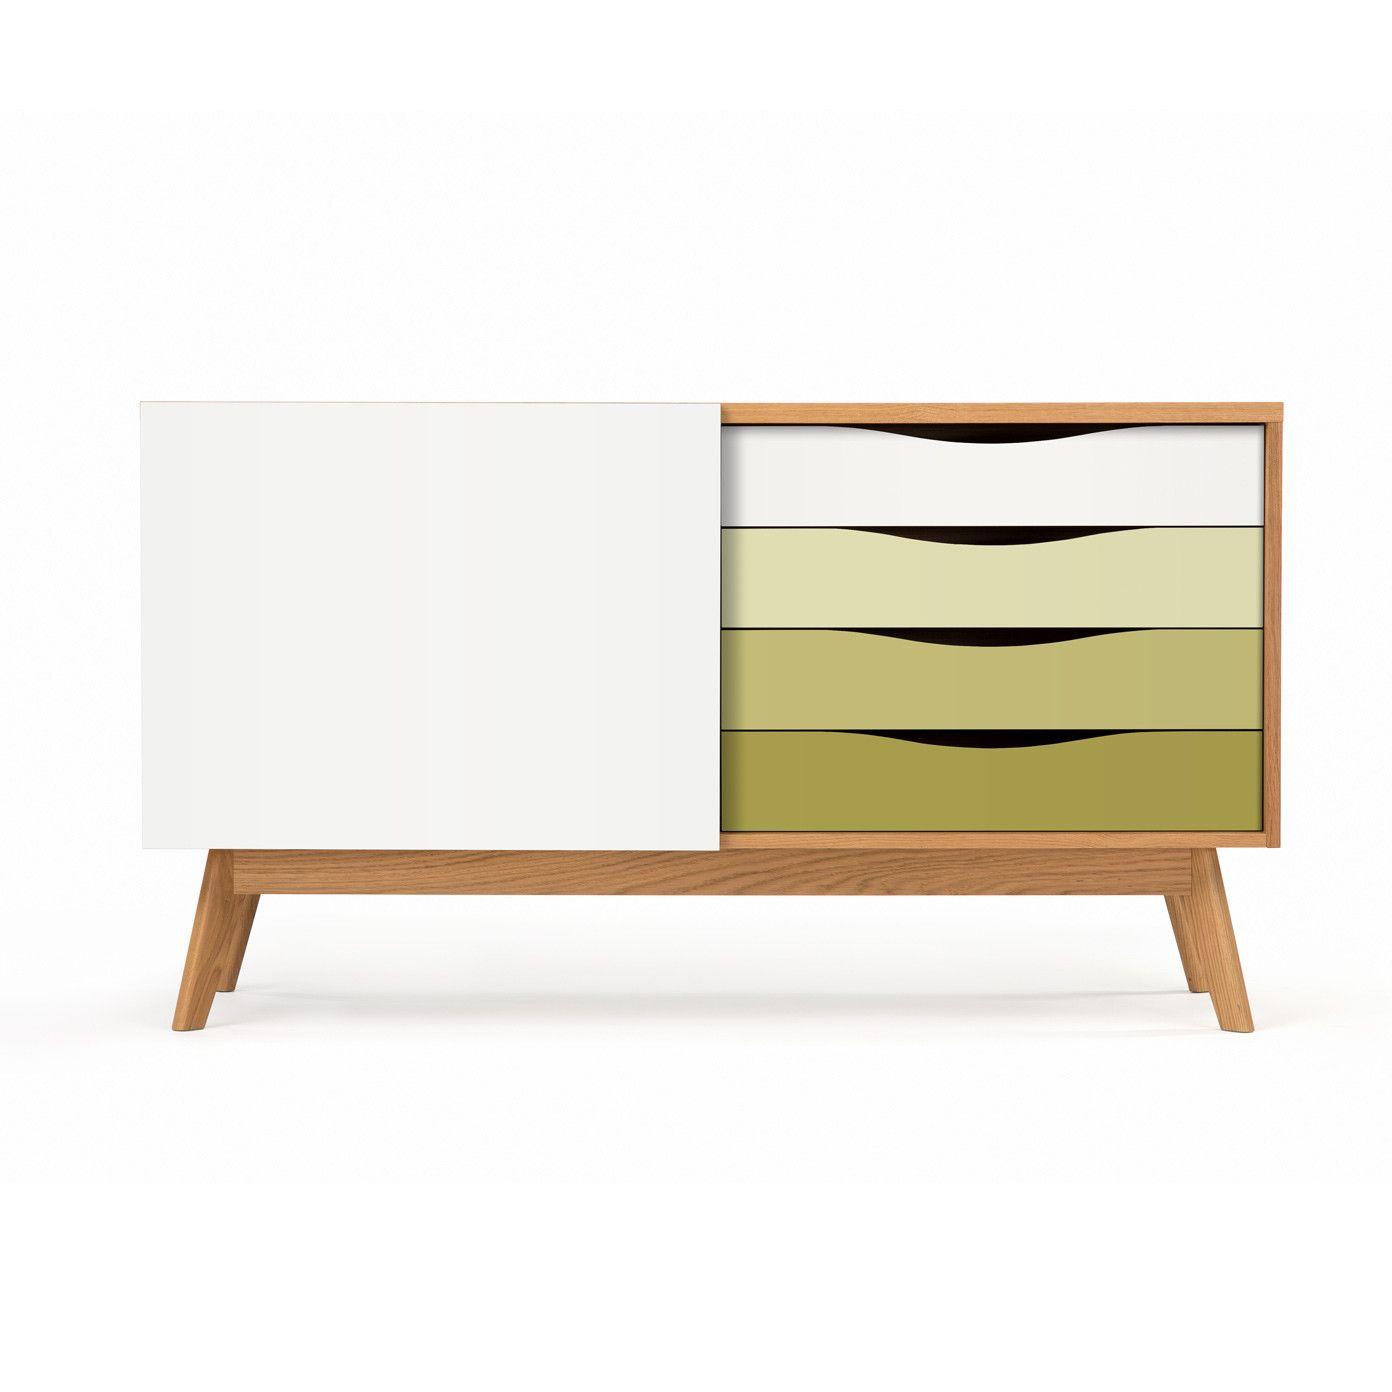 M Bla - Sideboard Avon By Woodman M Bla